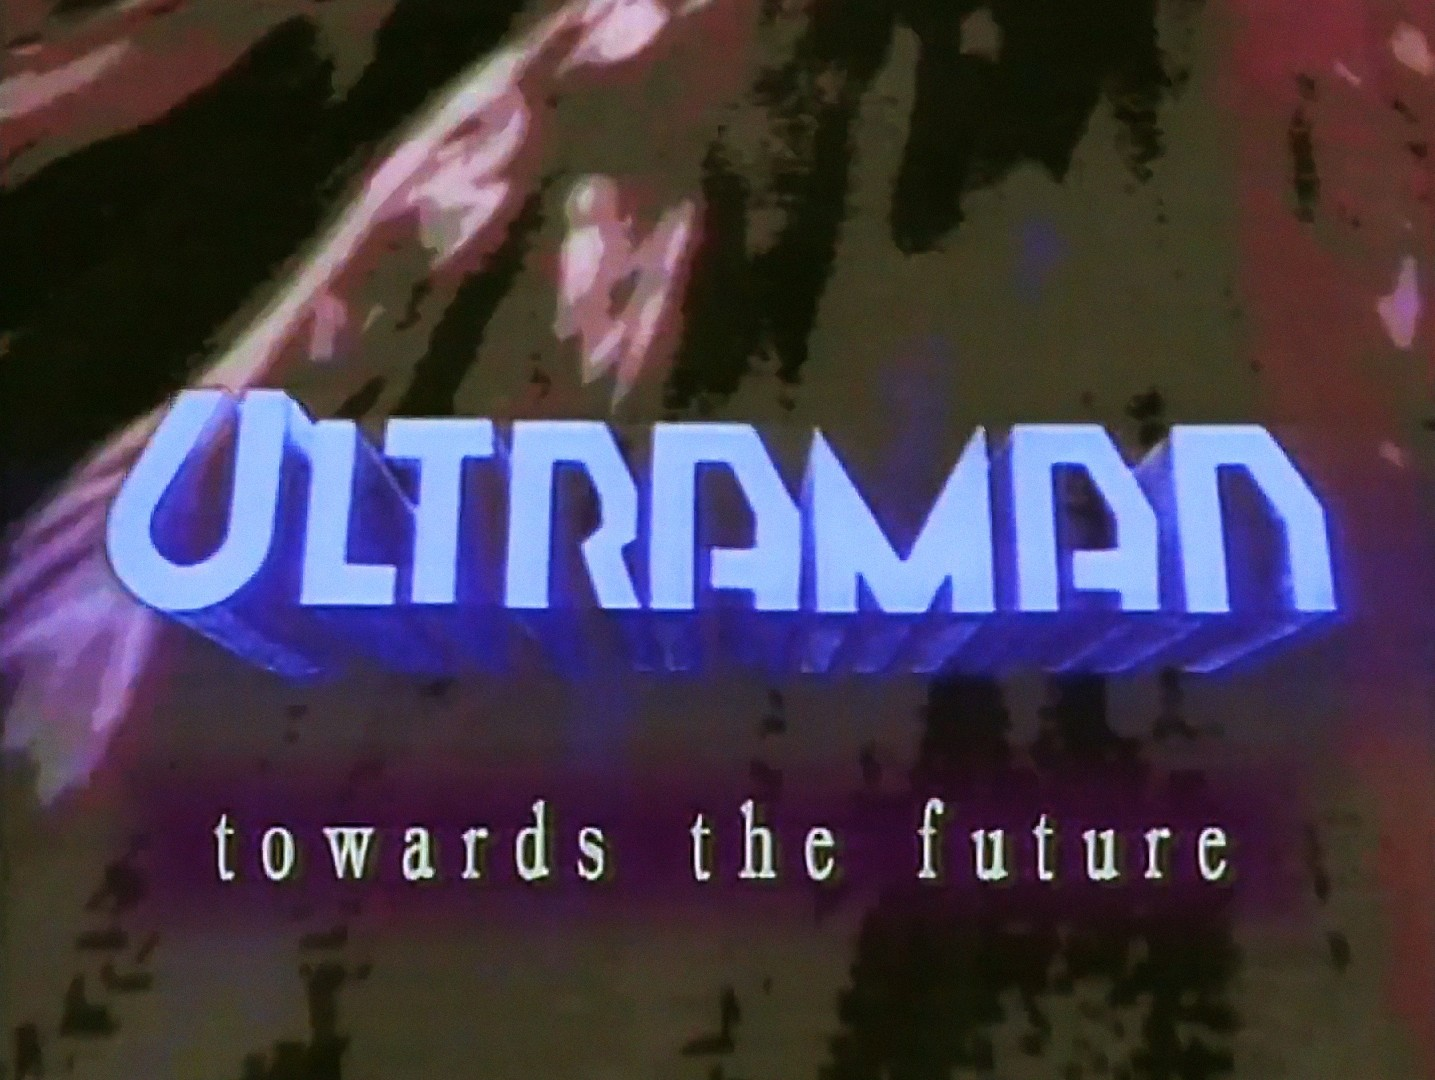 Towards The Future 13